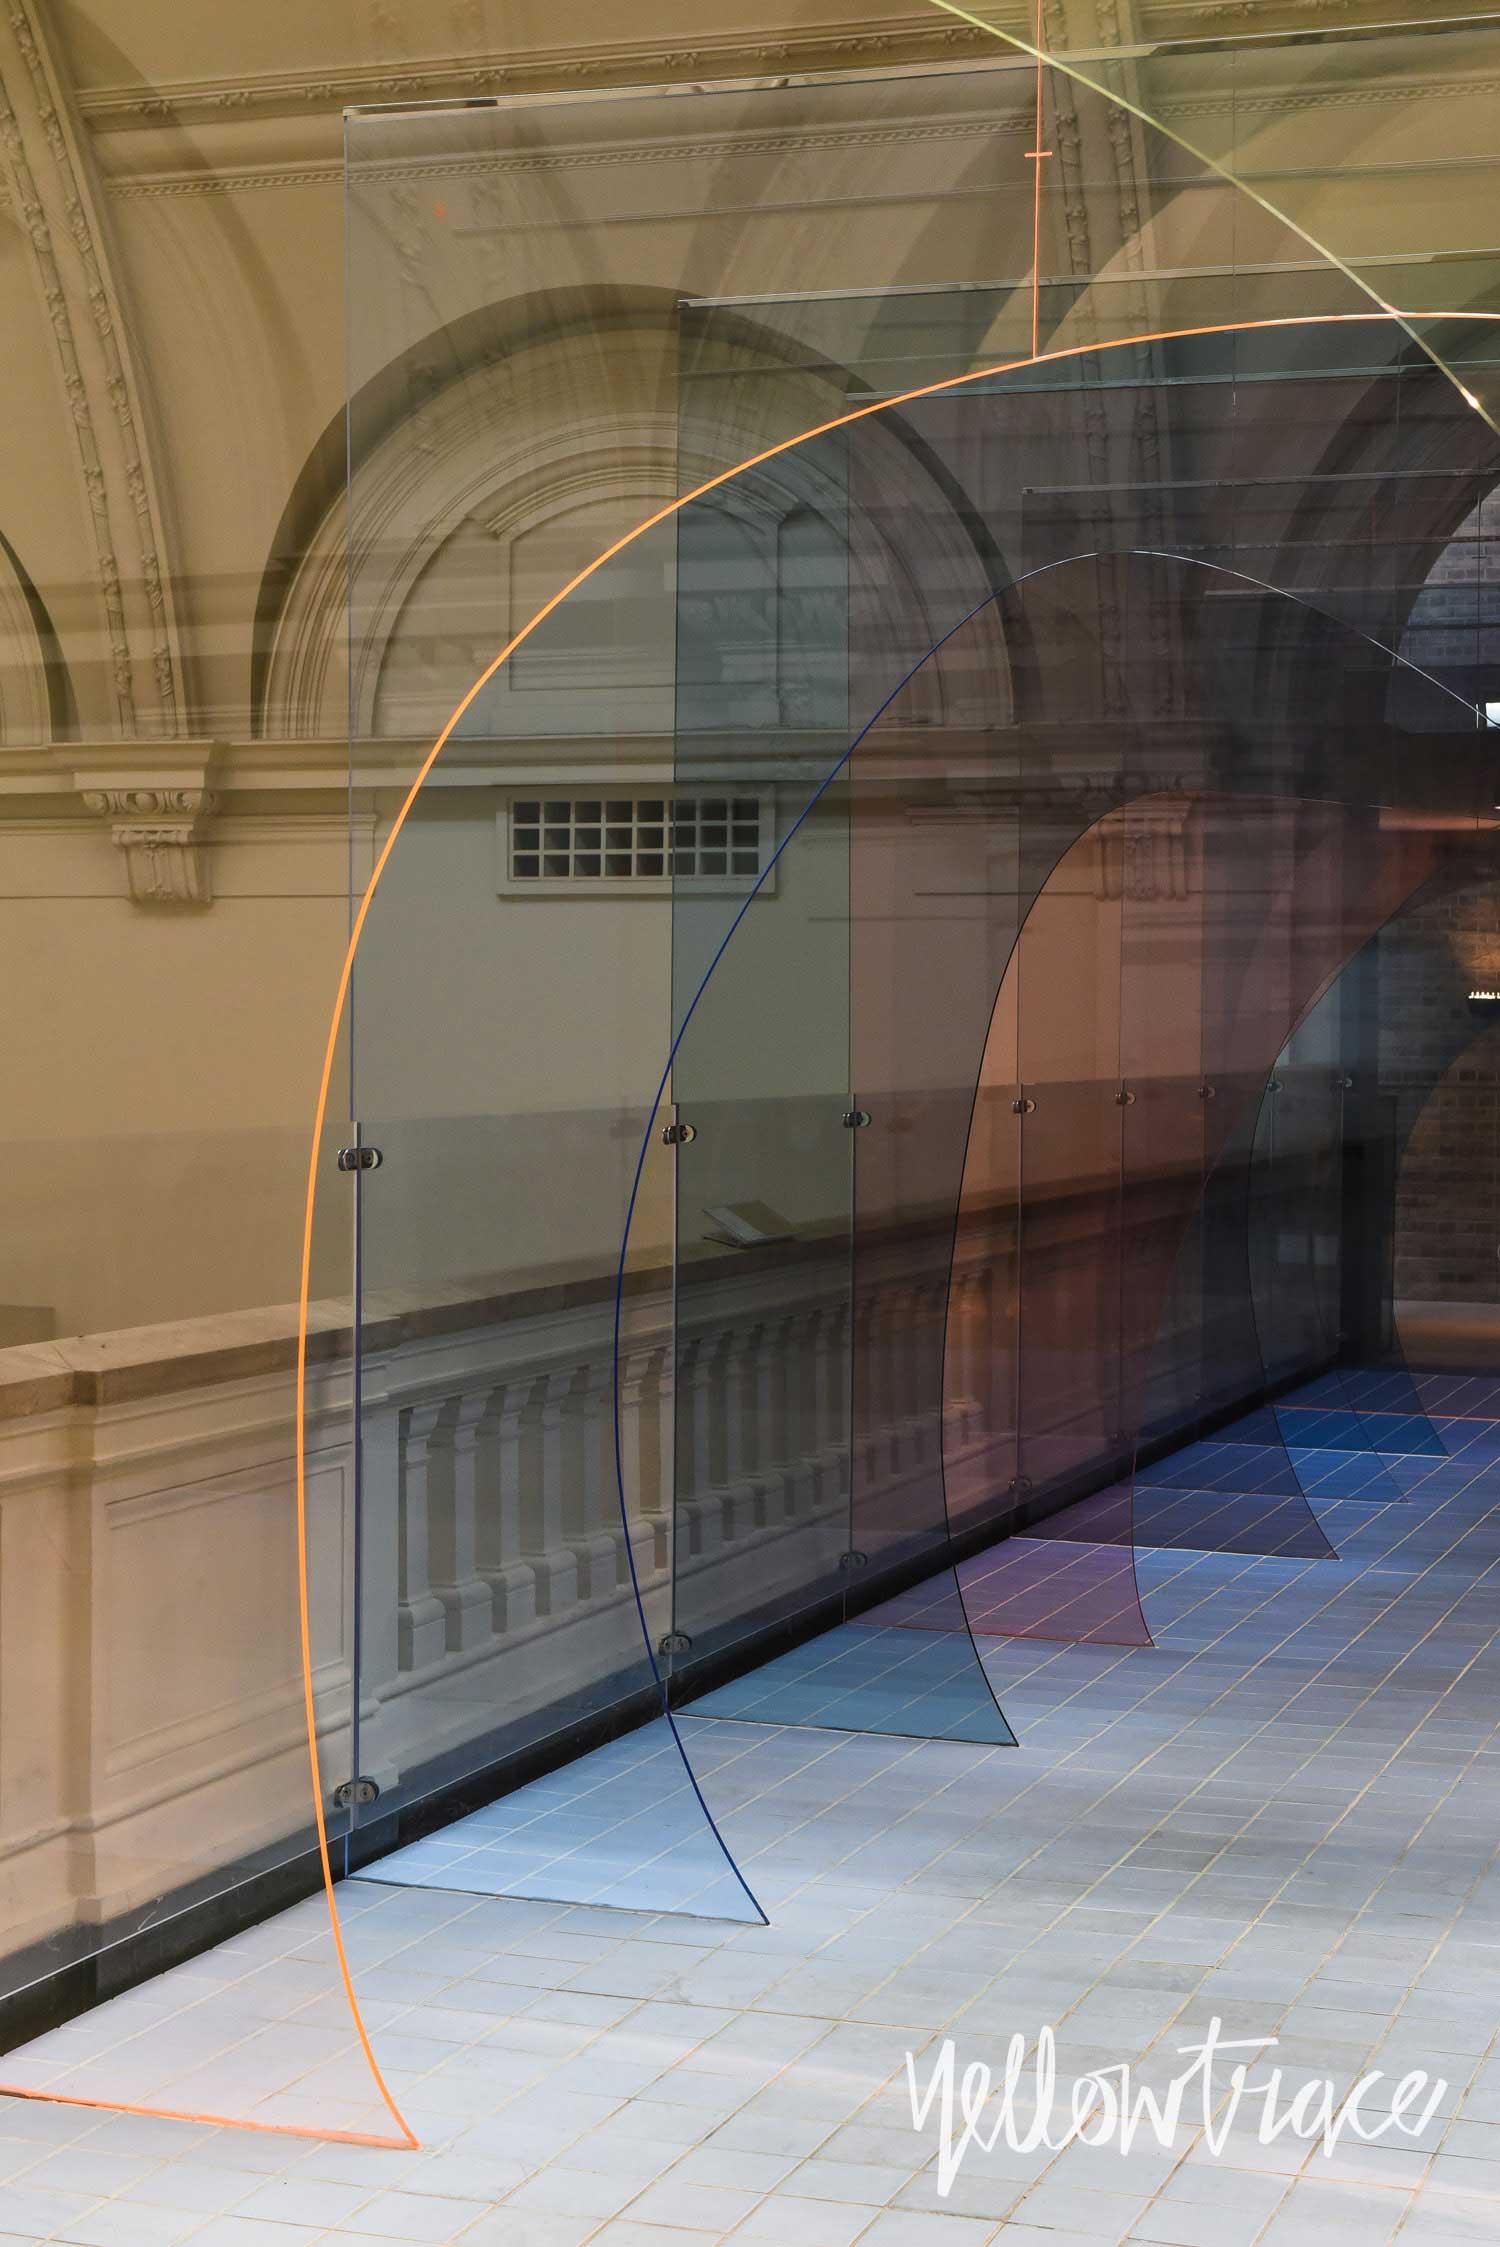 V & A Museum LDF15, Photo ©Nick Hughes | Yellowtrace